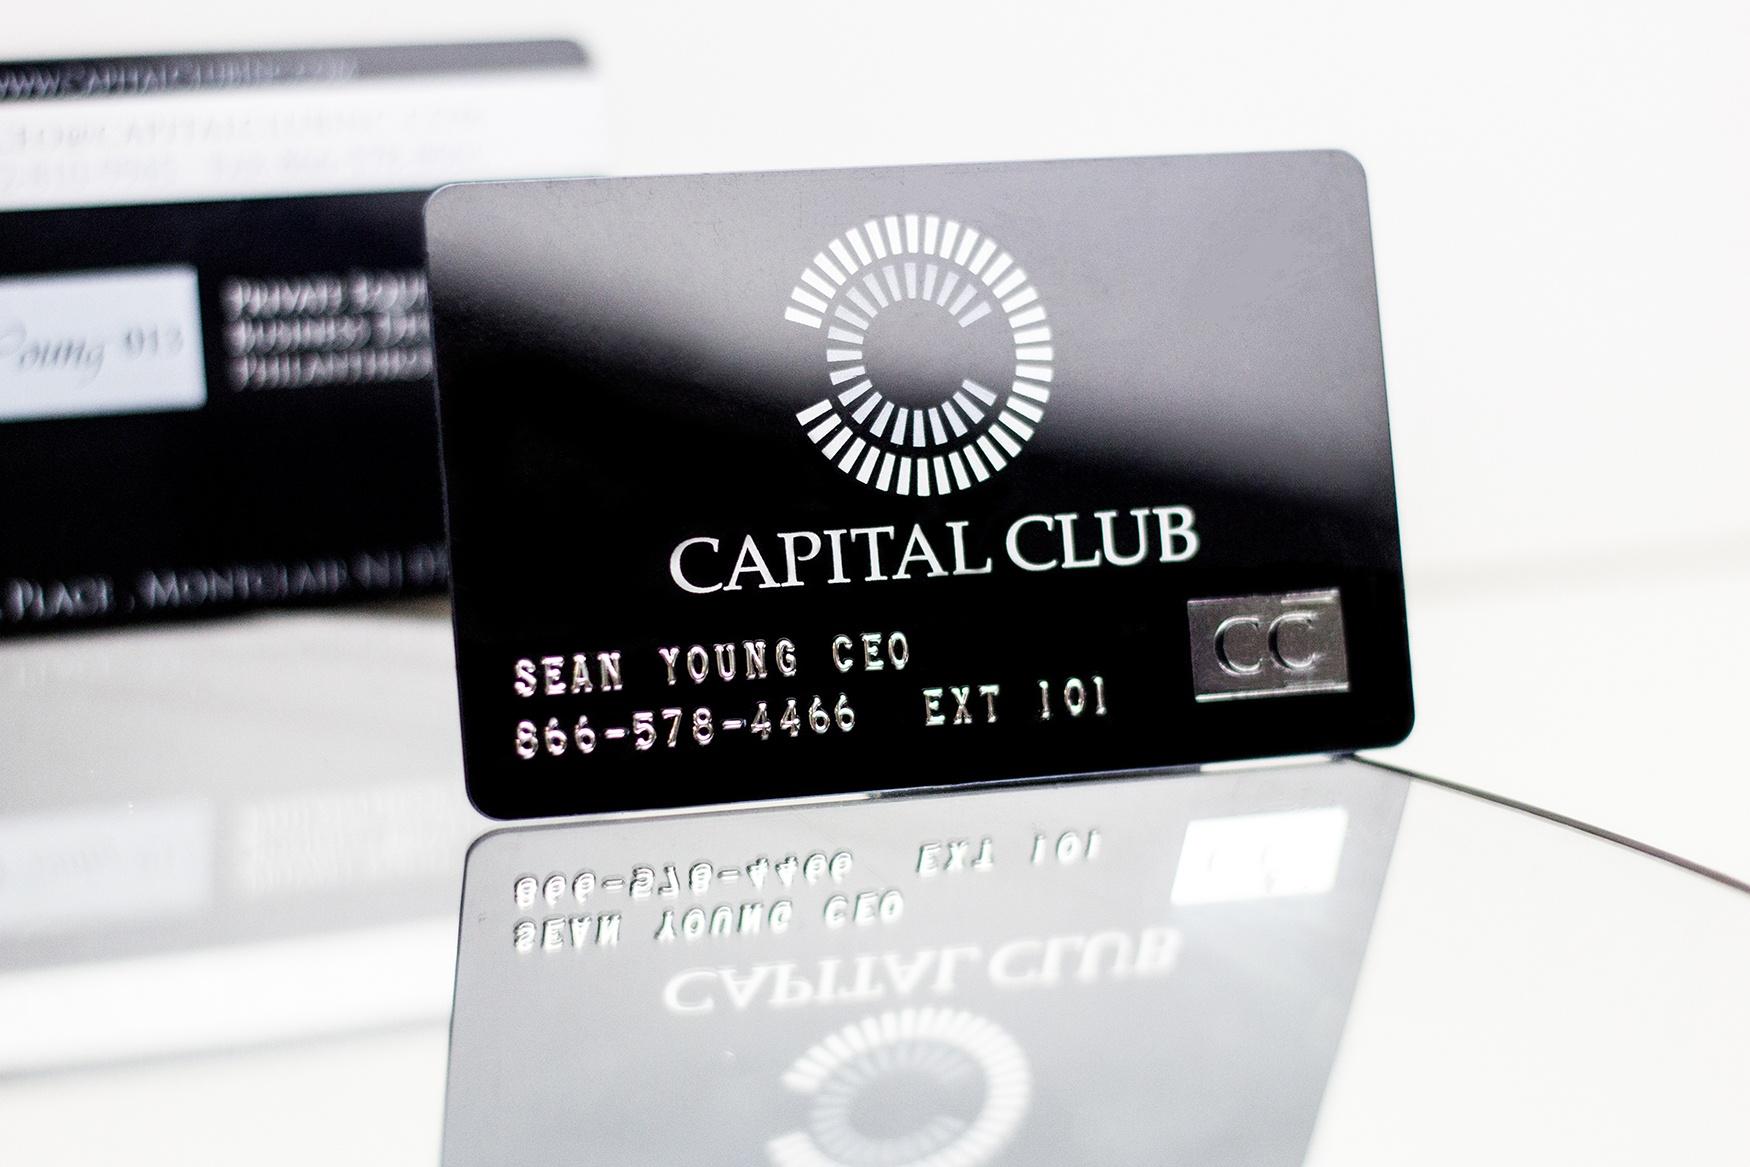 Embossed Business Cards | Plastic Printers, Inc.